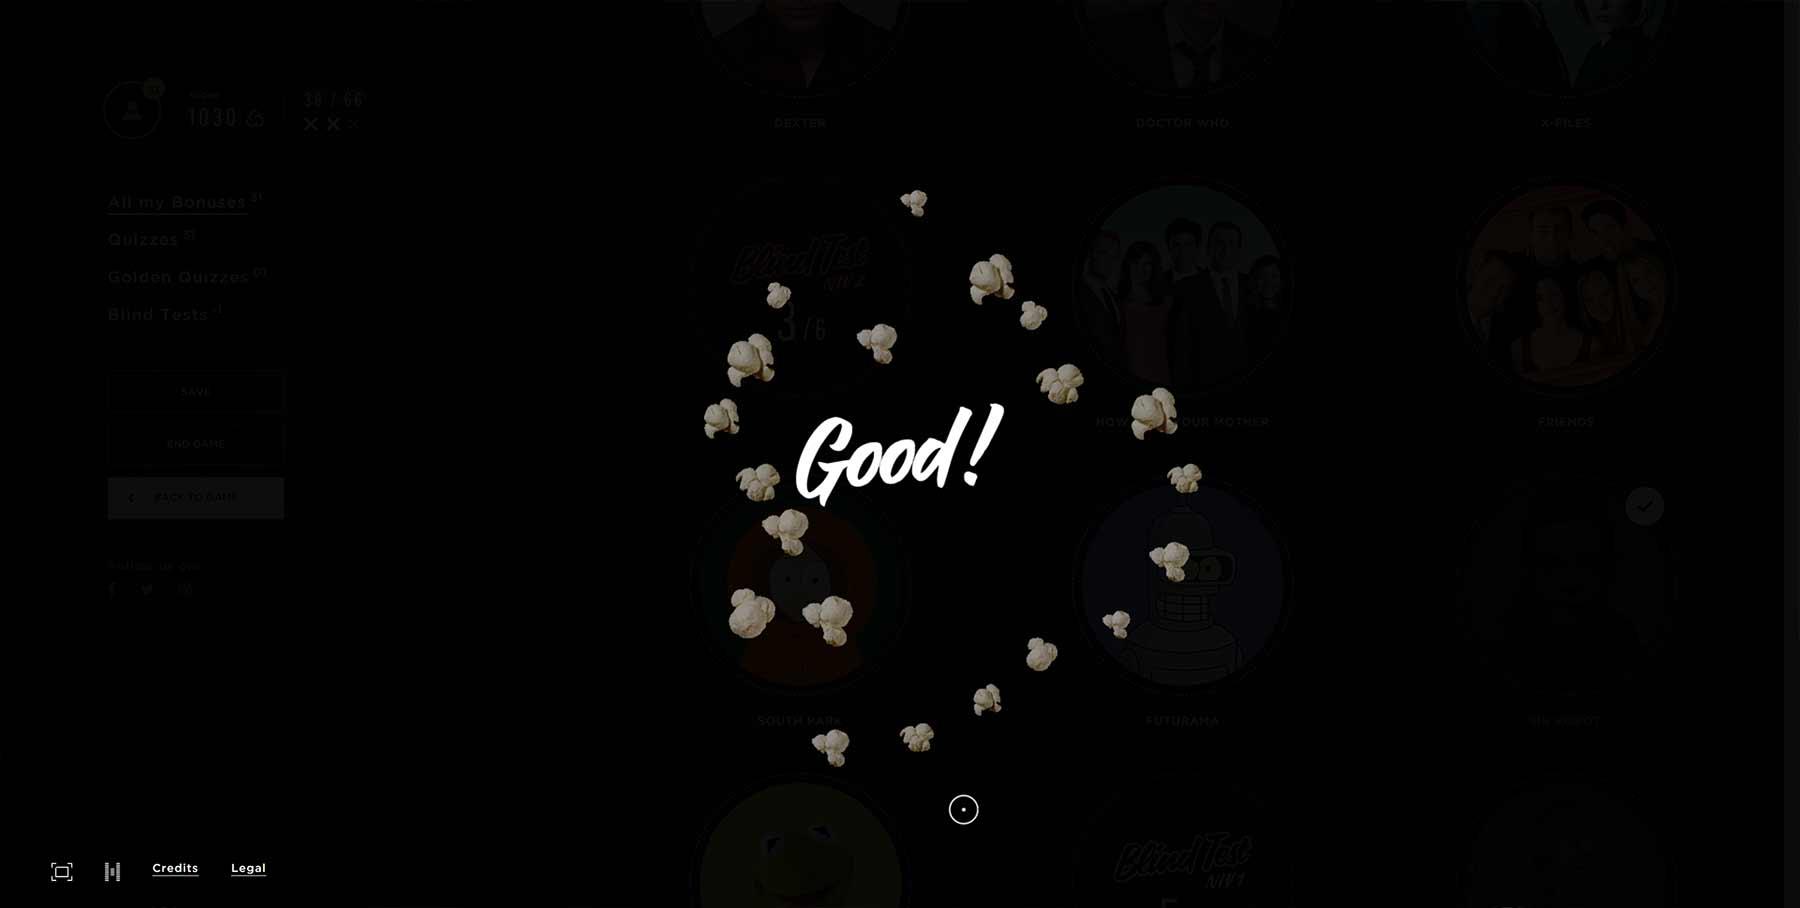 Interaktives Rätselspiel mit 66 versteckten Serien popcorn-TV_06